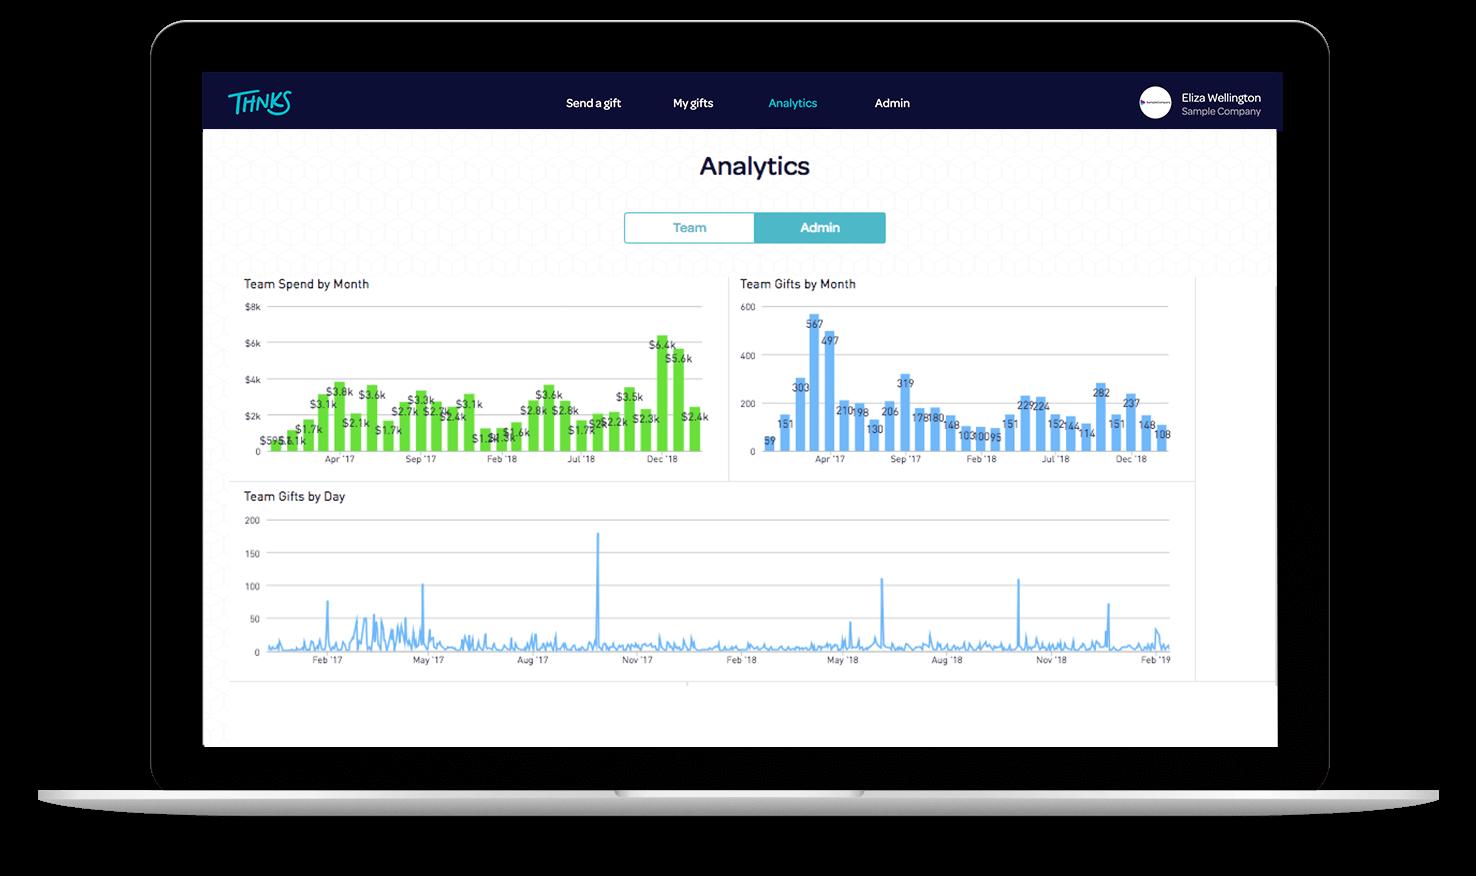 macbook showing Thnks analytics graphs